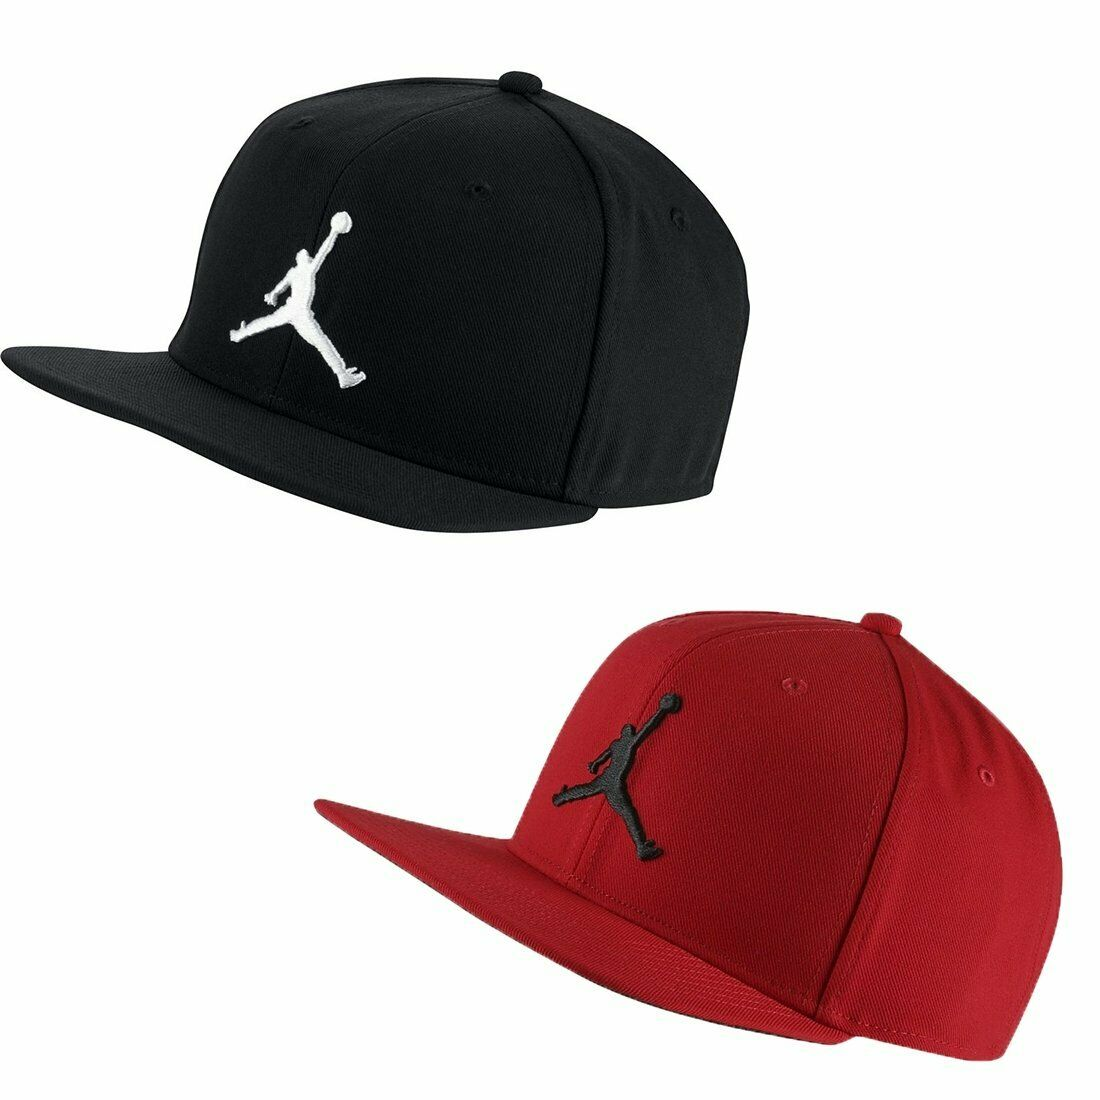 New Nike Unisex Jordan Pro Jumpman Snapback Cap//Hat Black//White AR2118-013